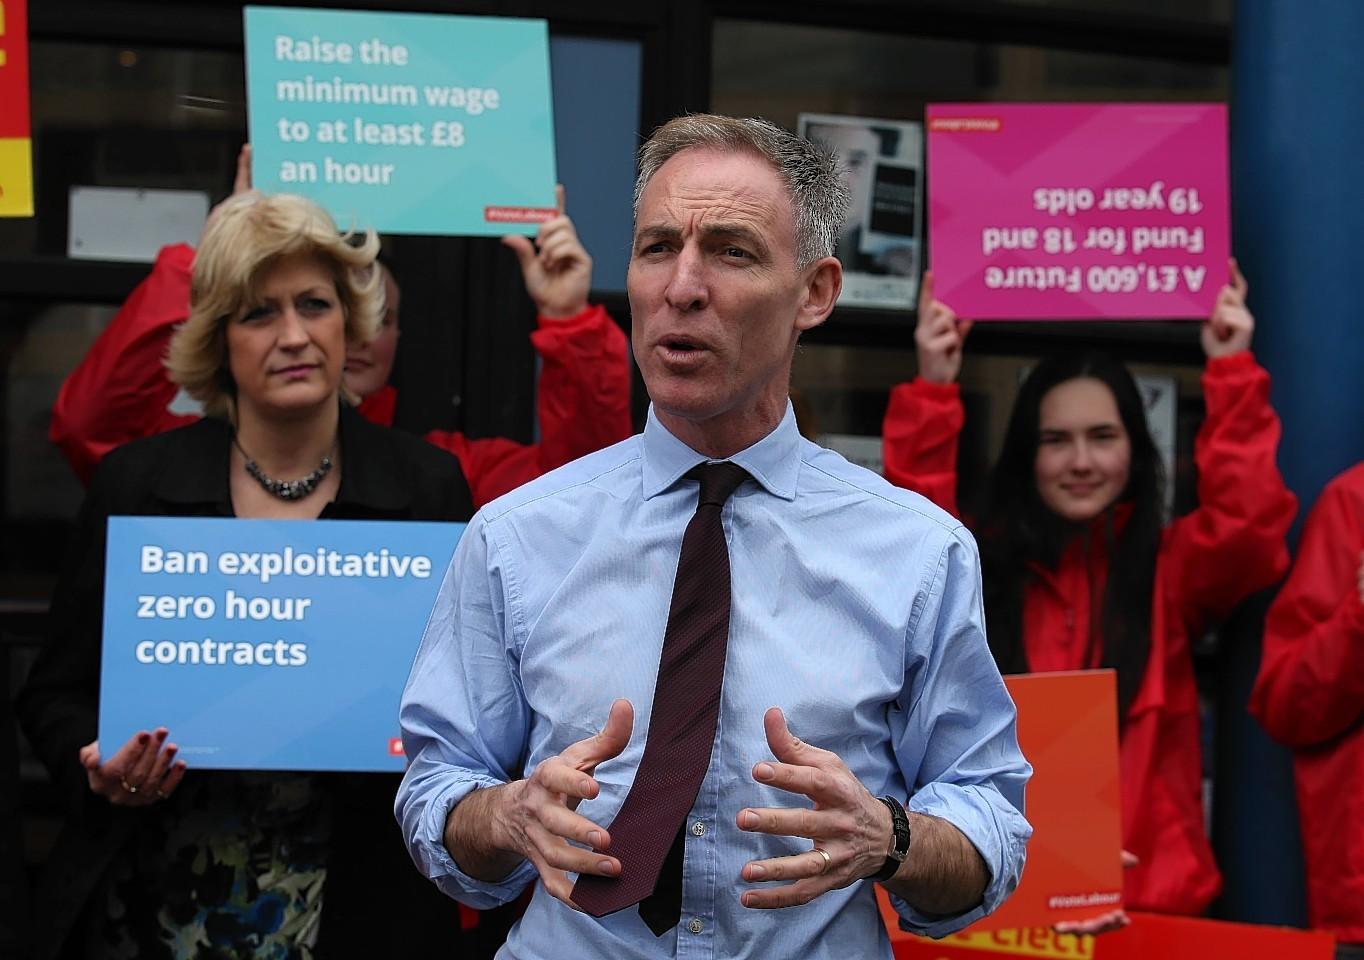 Jim Murphy was speaking in Aberdeen yesterday